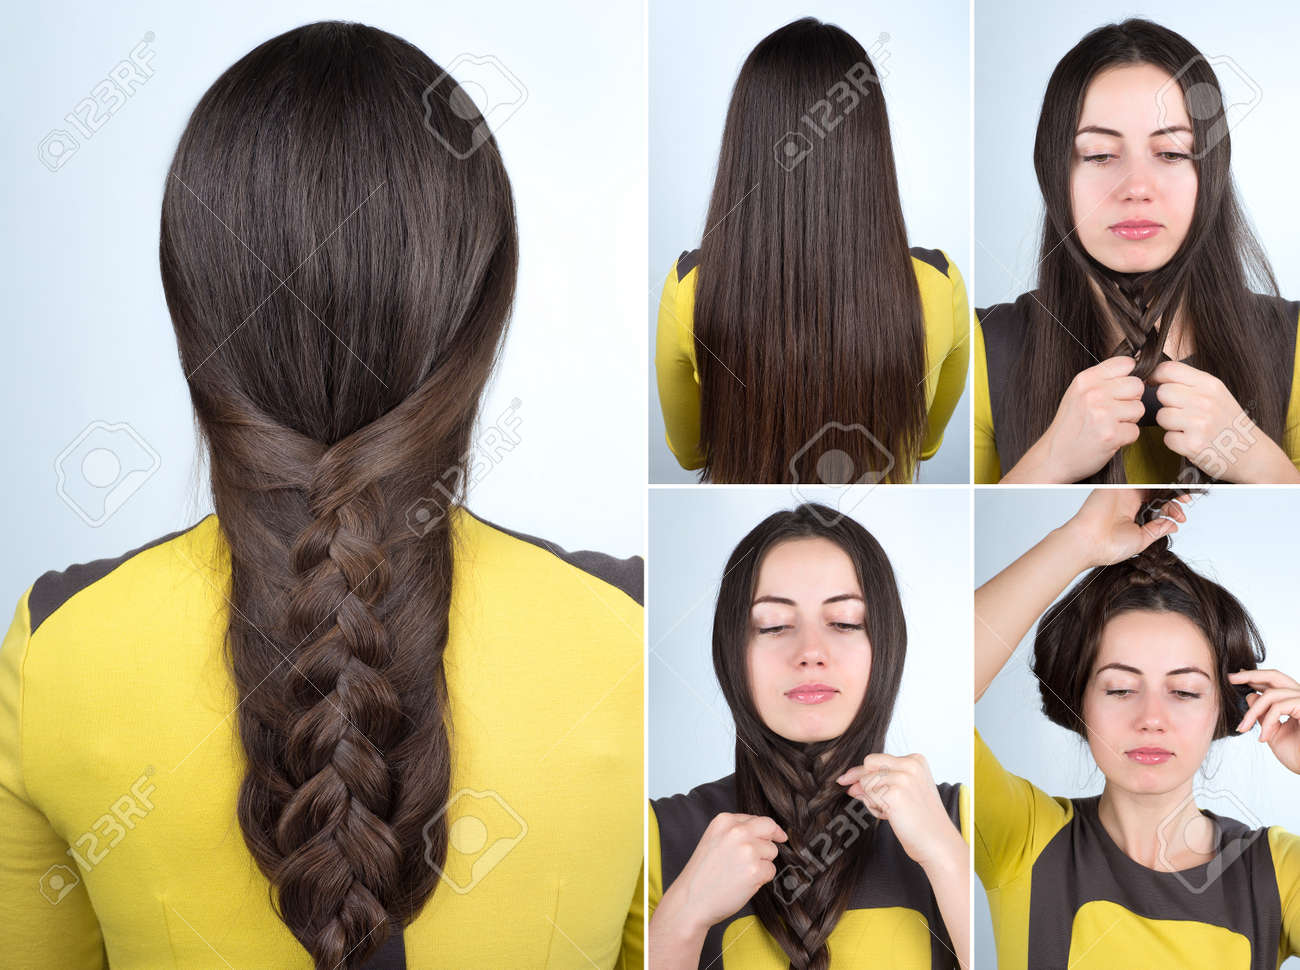 Simple Braid Hairstyle Tutorial. Plait Hairstyle For Long Hair. Fast  Hairstyle For Self Tutorial